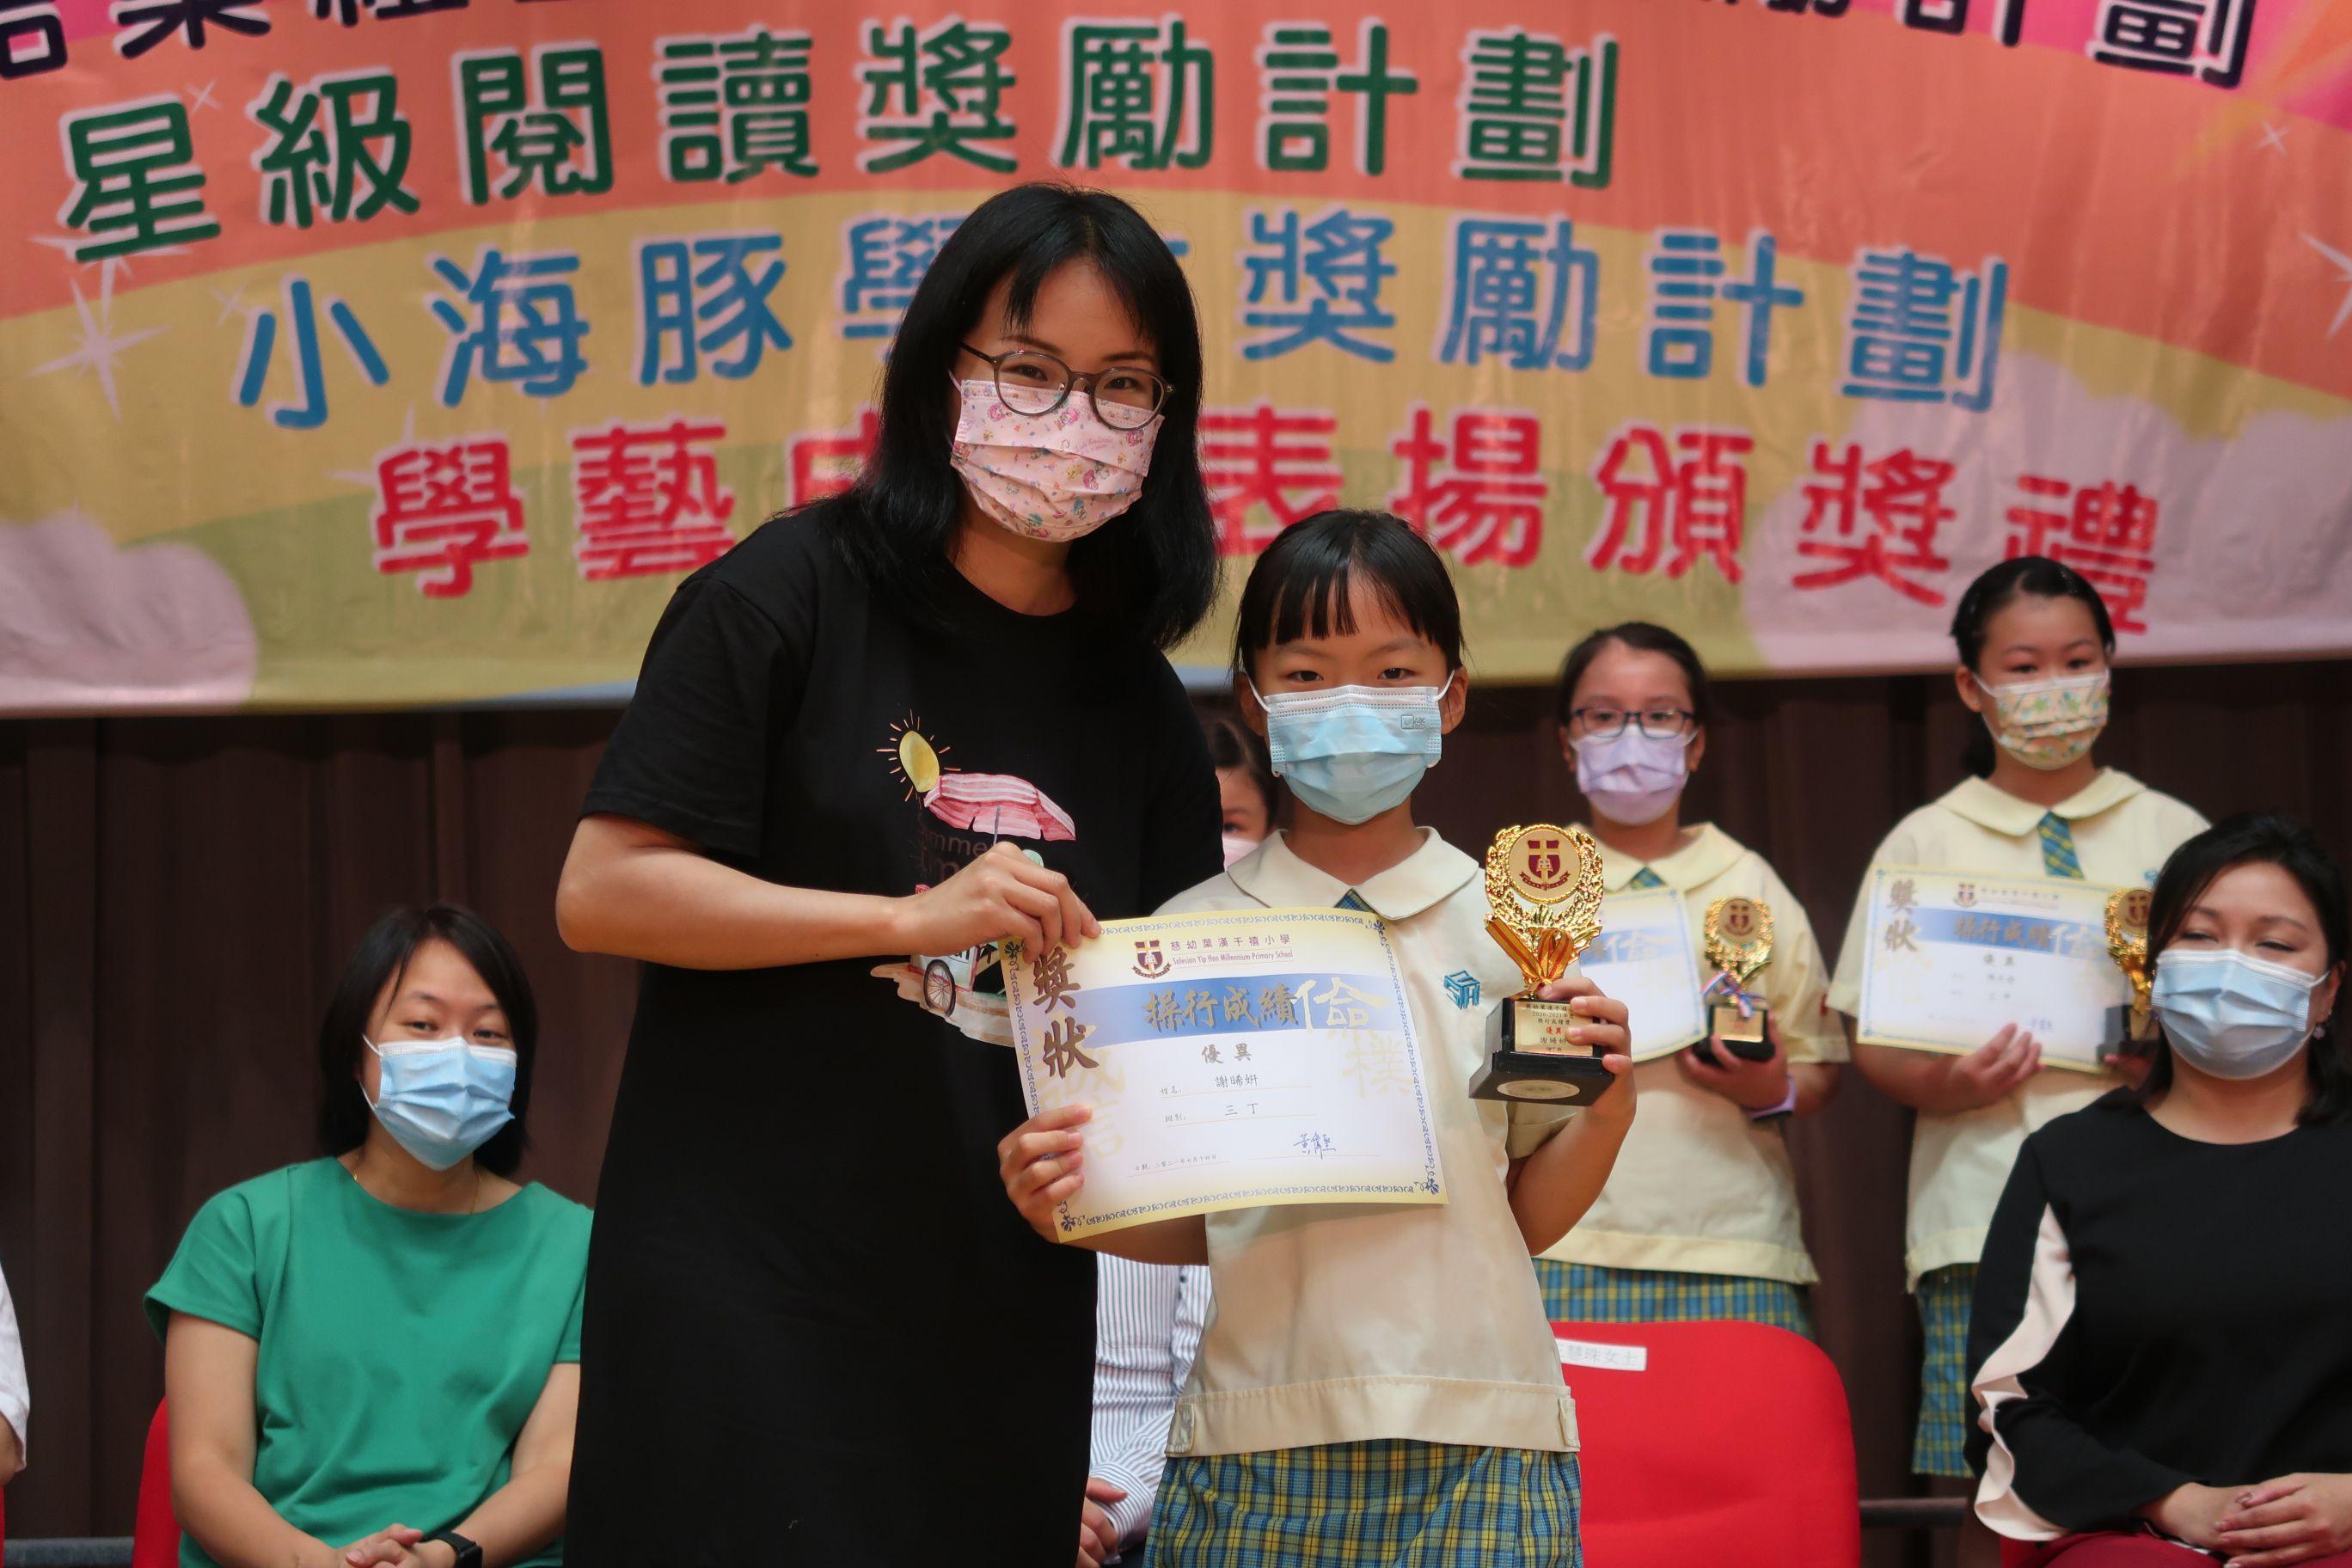 https://syh.edu.hk/sites/default/files/img_5492.jpg